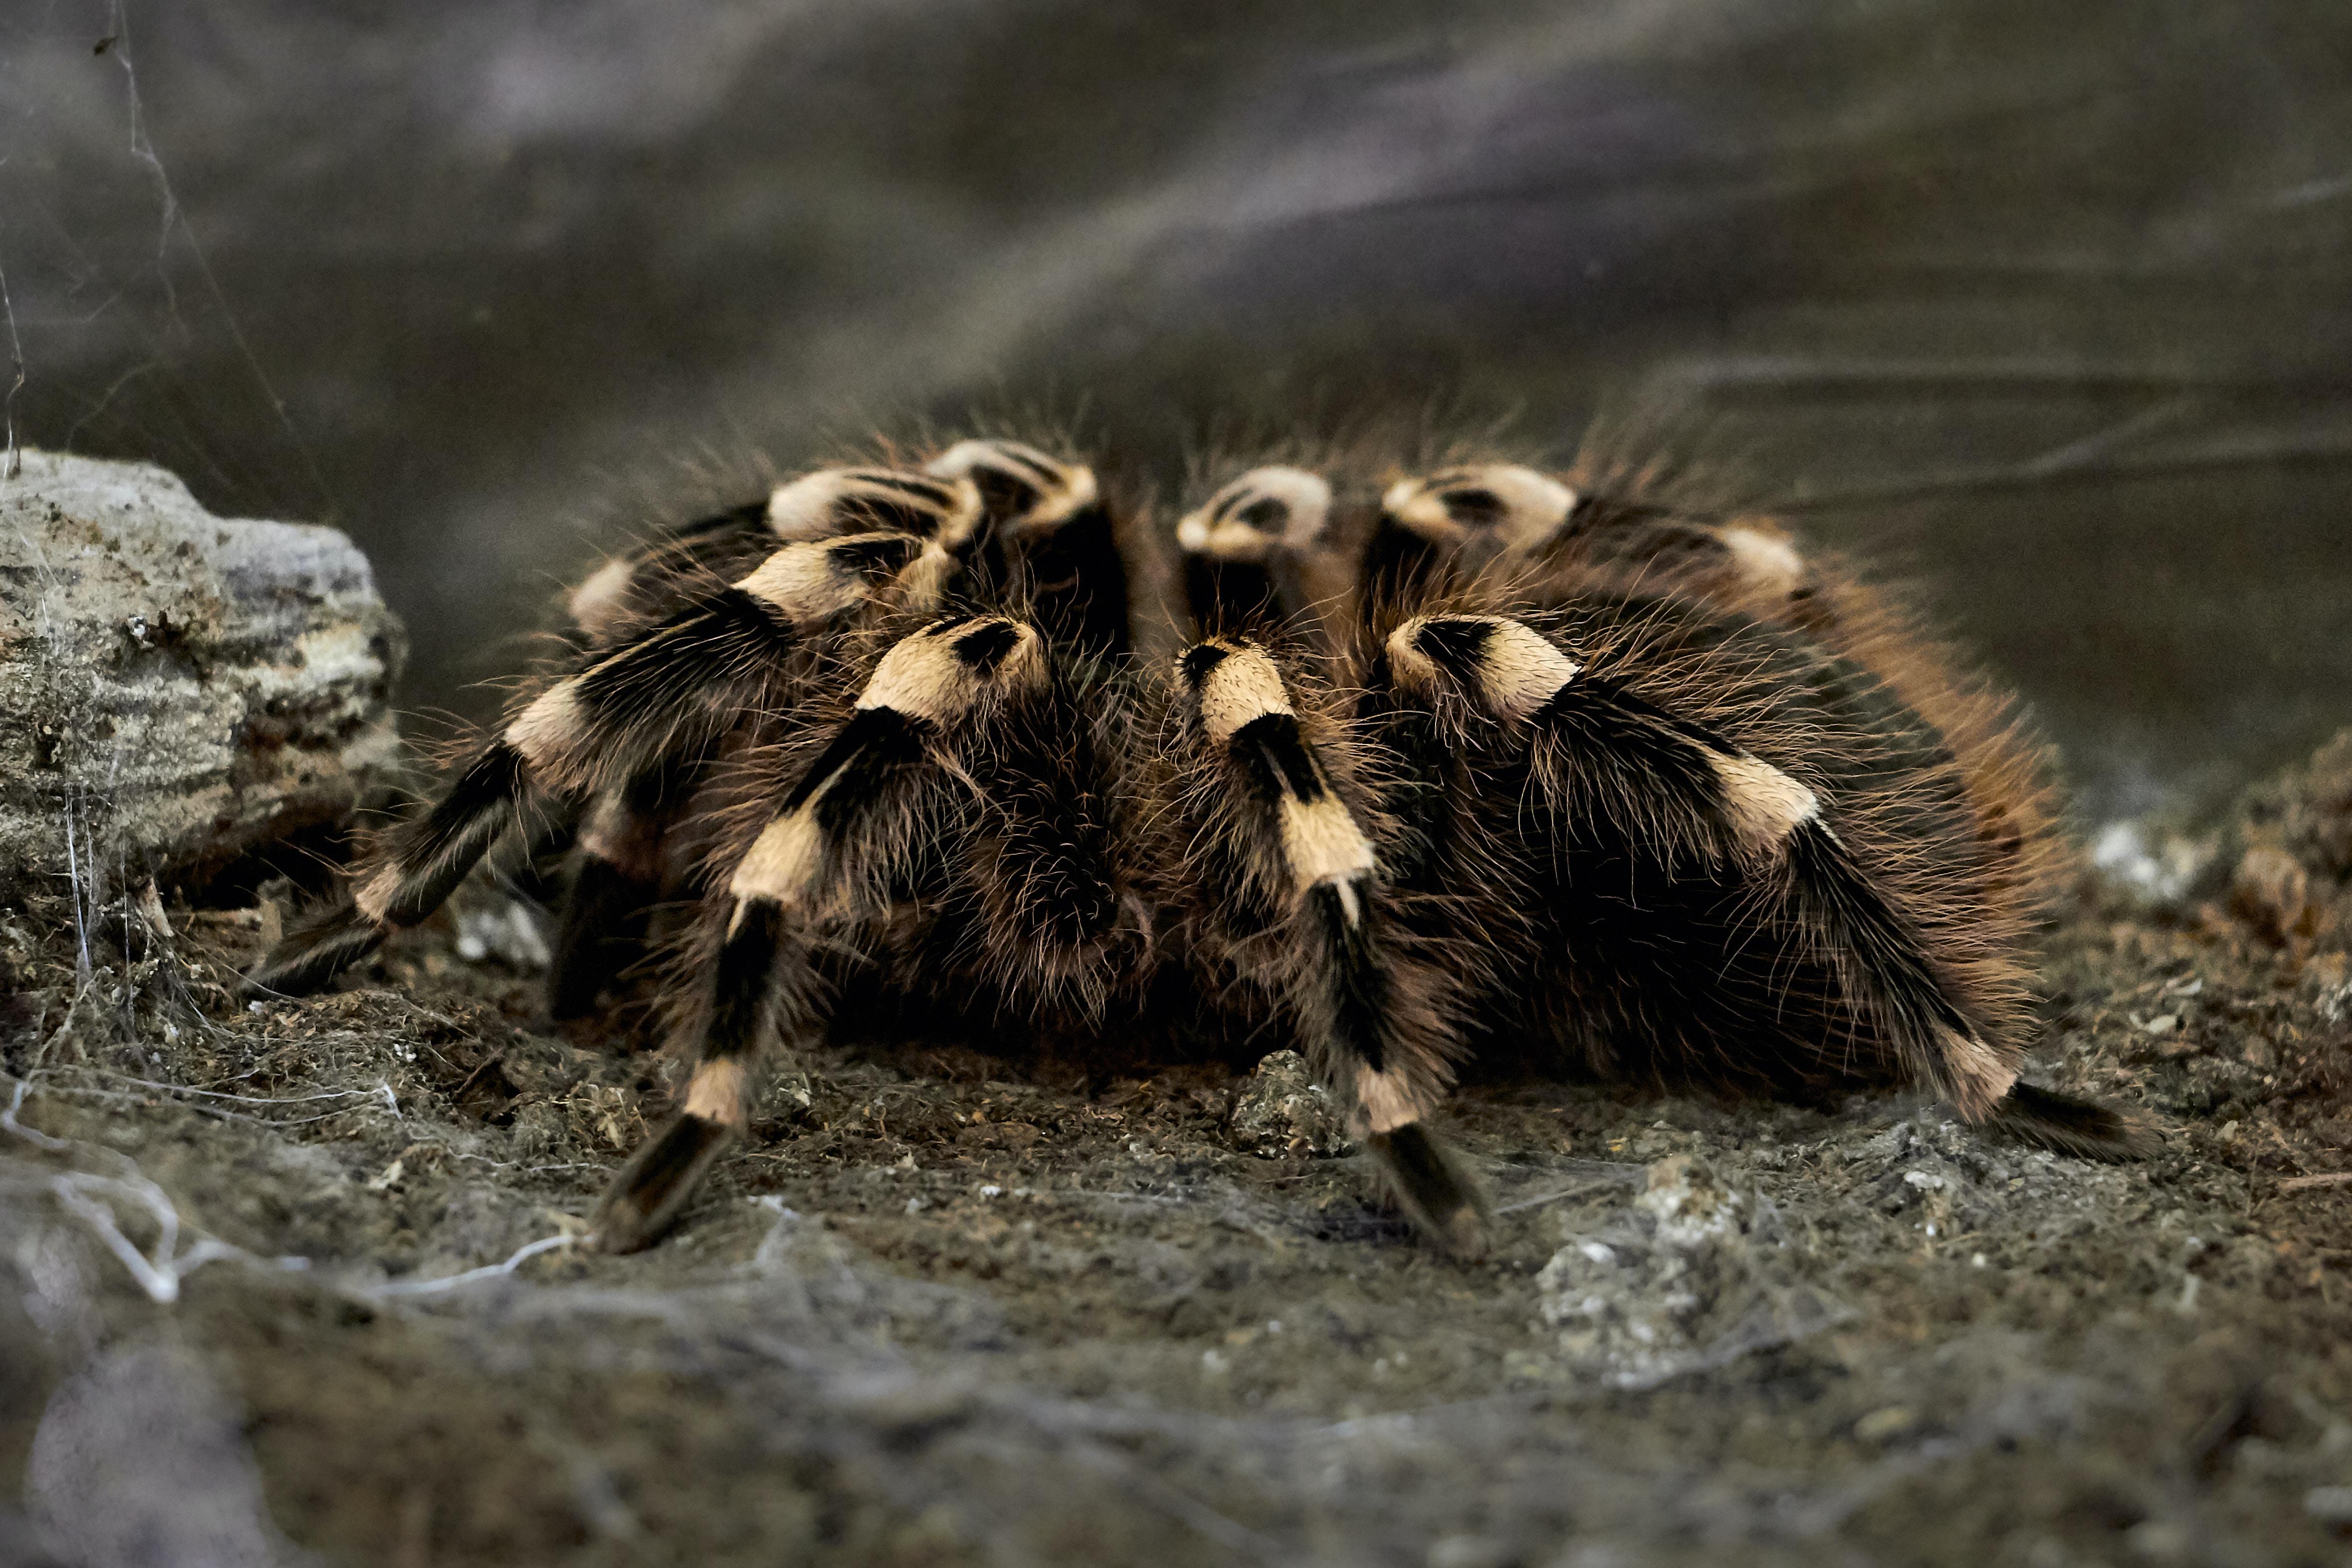 black and beige tarantula on brown soil